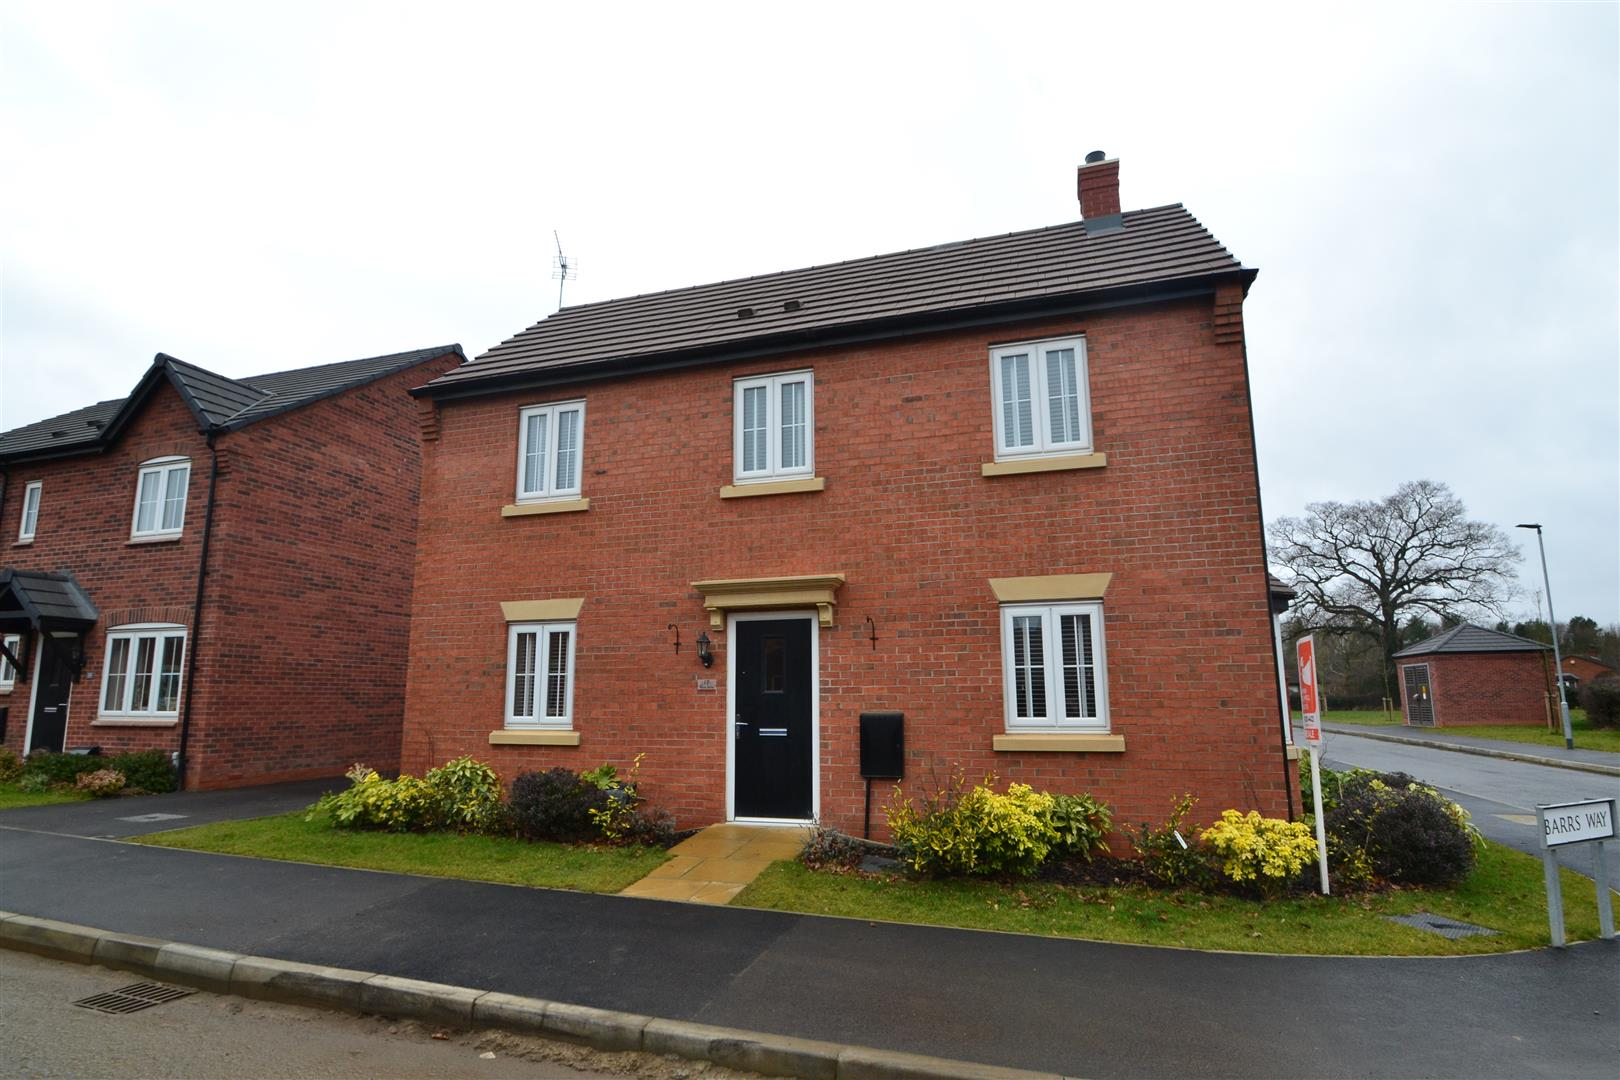 4 Bedrooms Detached House for sale in Baum Drive, Mountsorrel, Loughborough